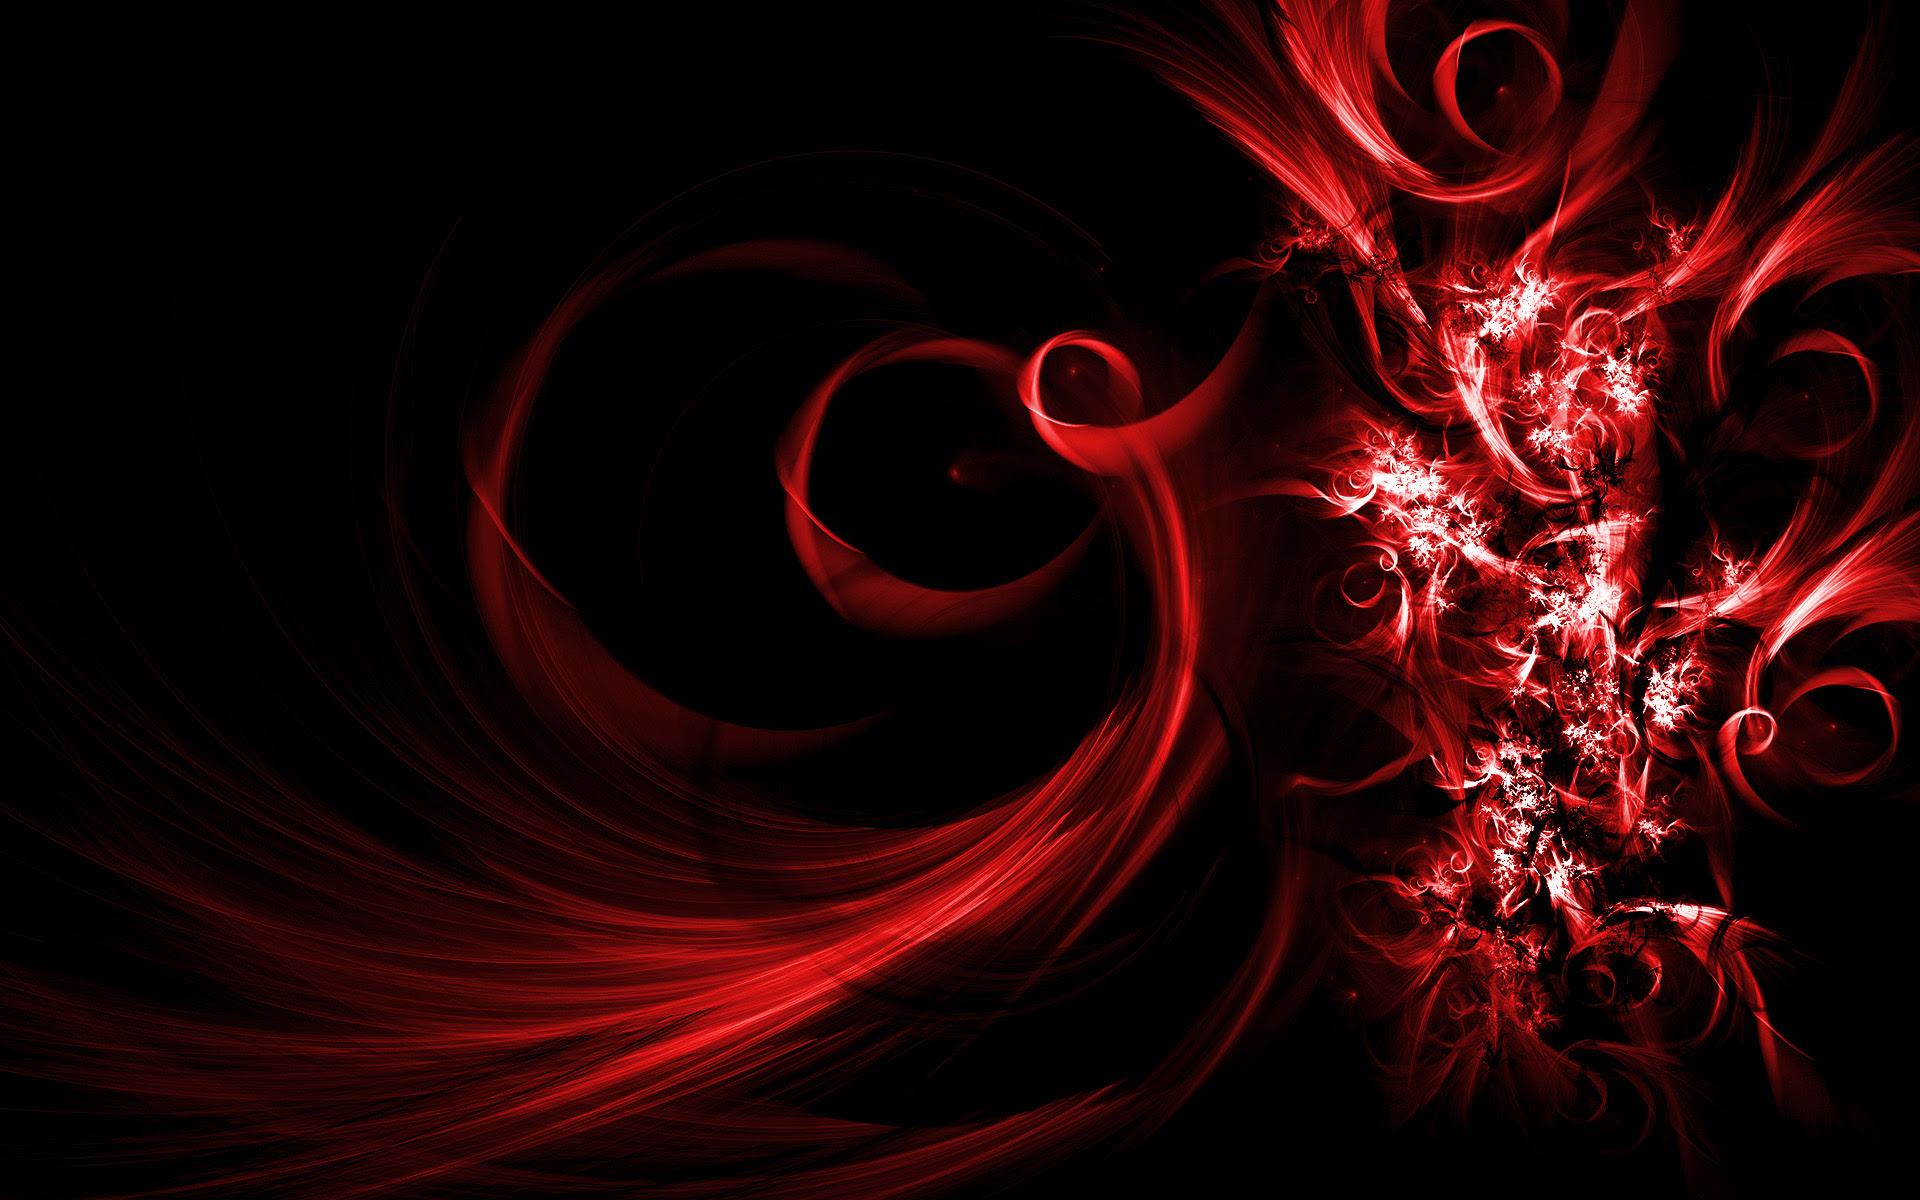 Wallpaper Hd Red